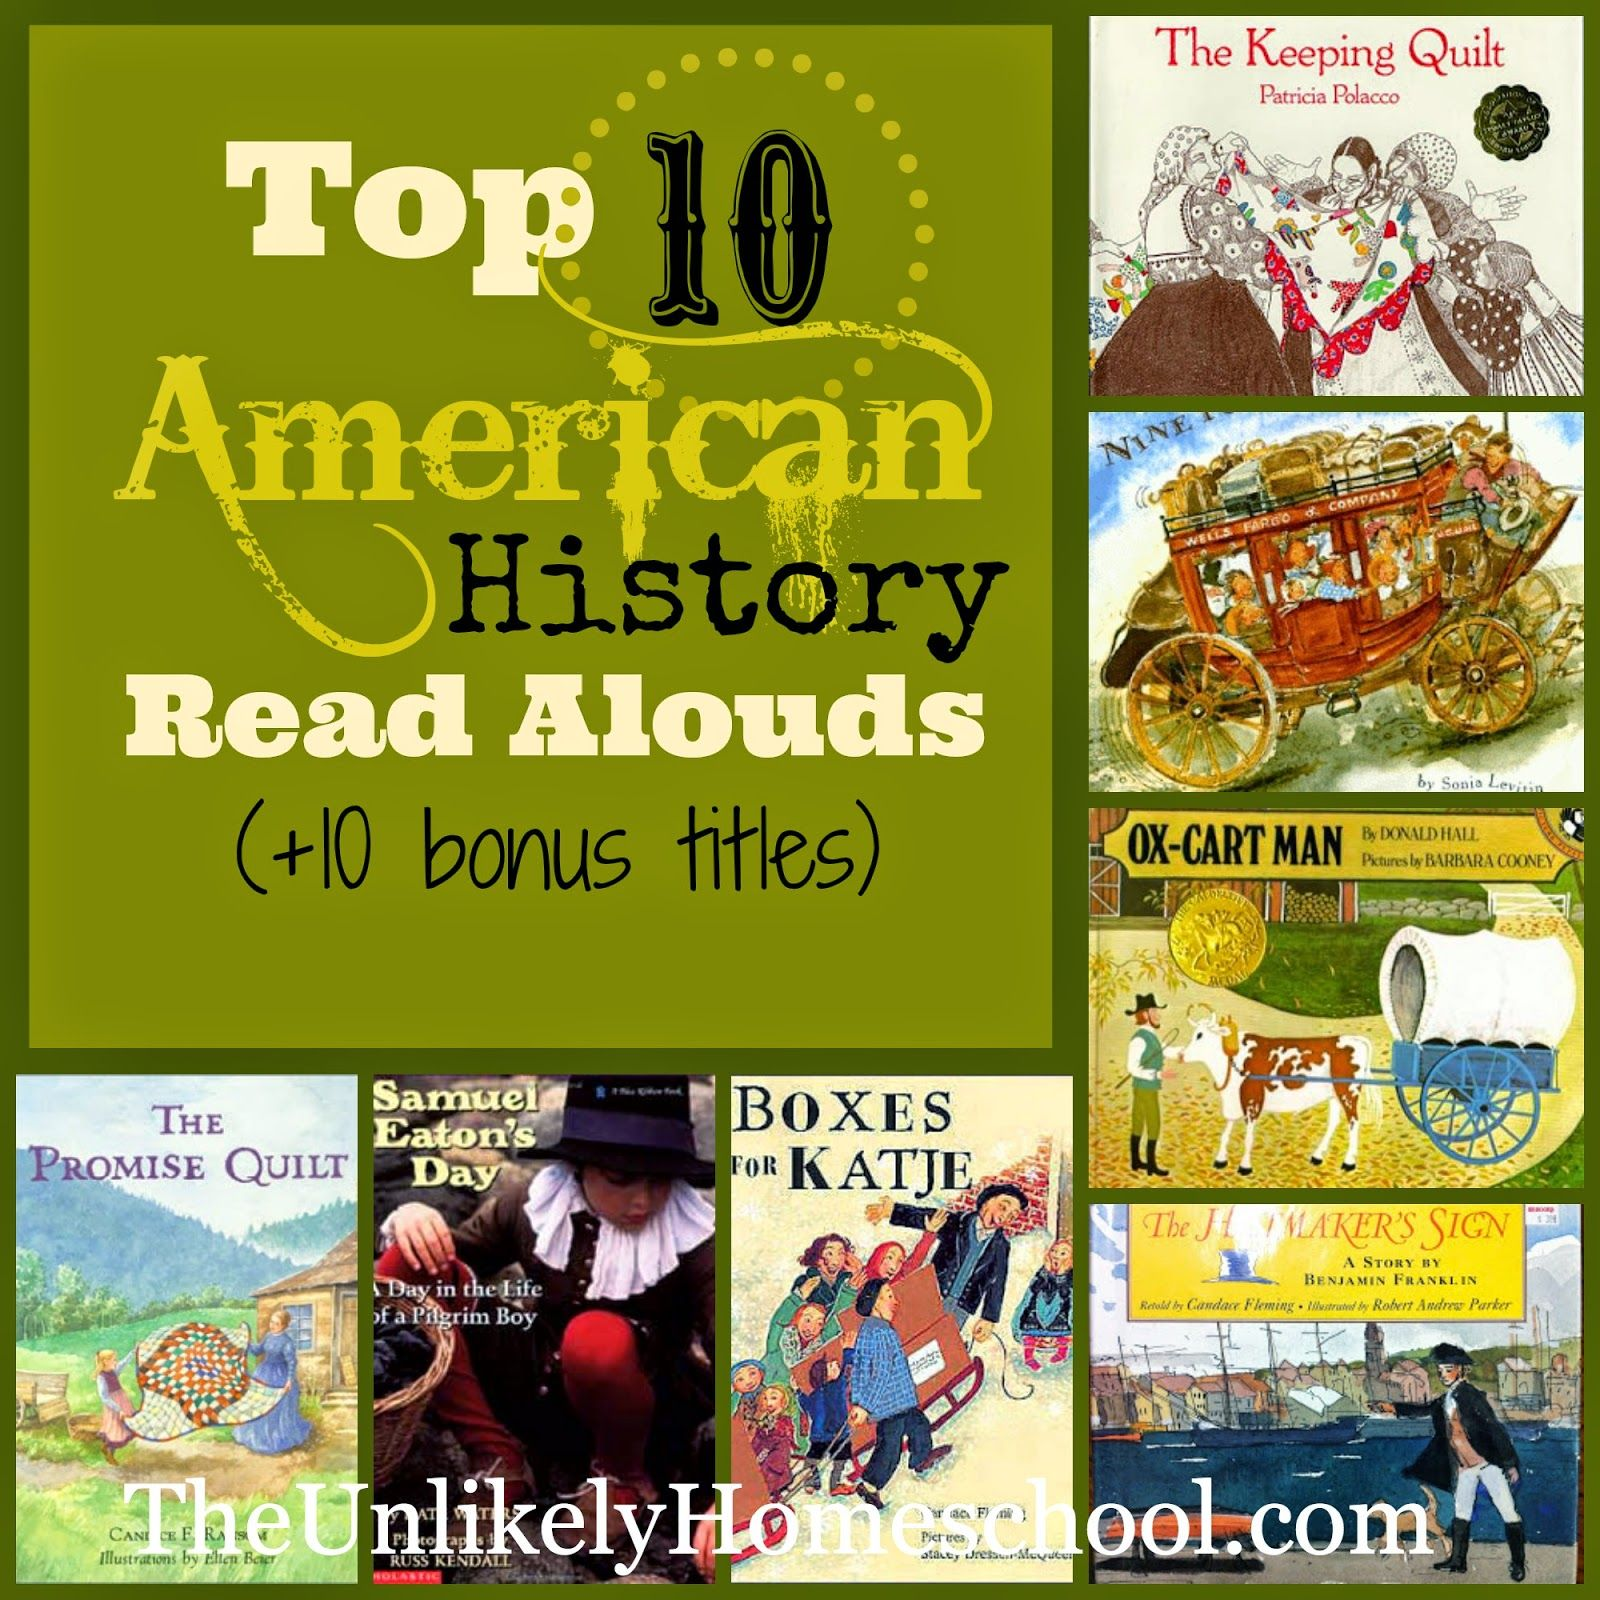 Top 10 American History Read Alouds